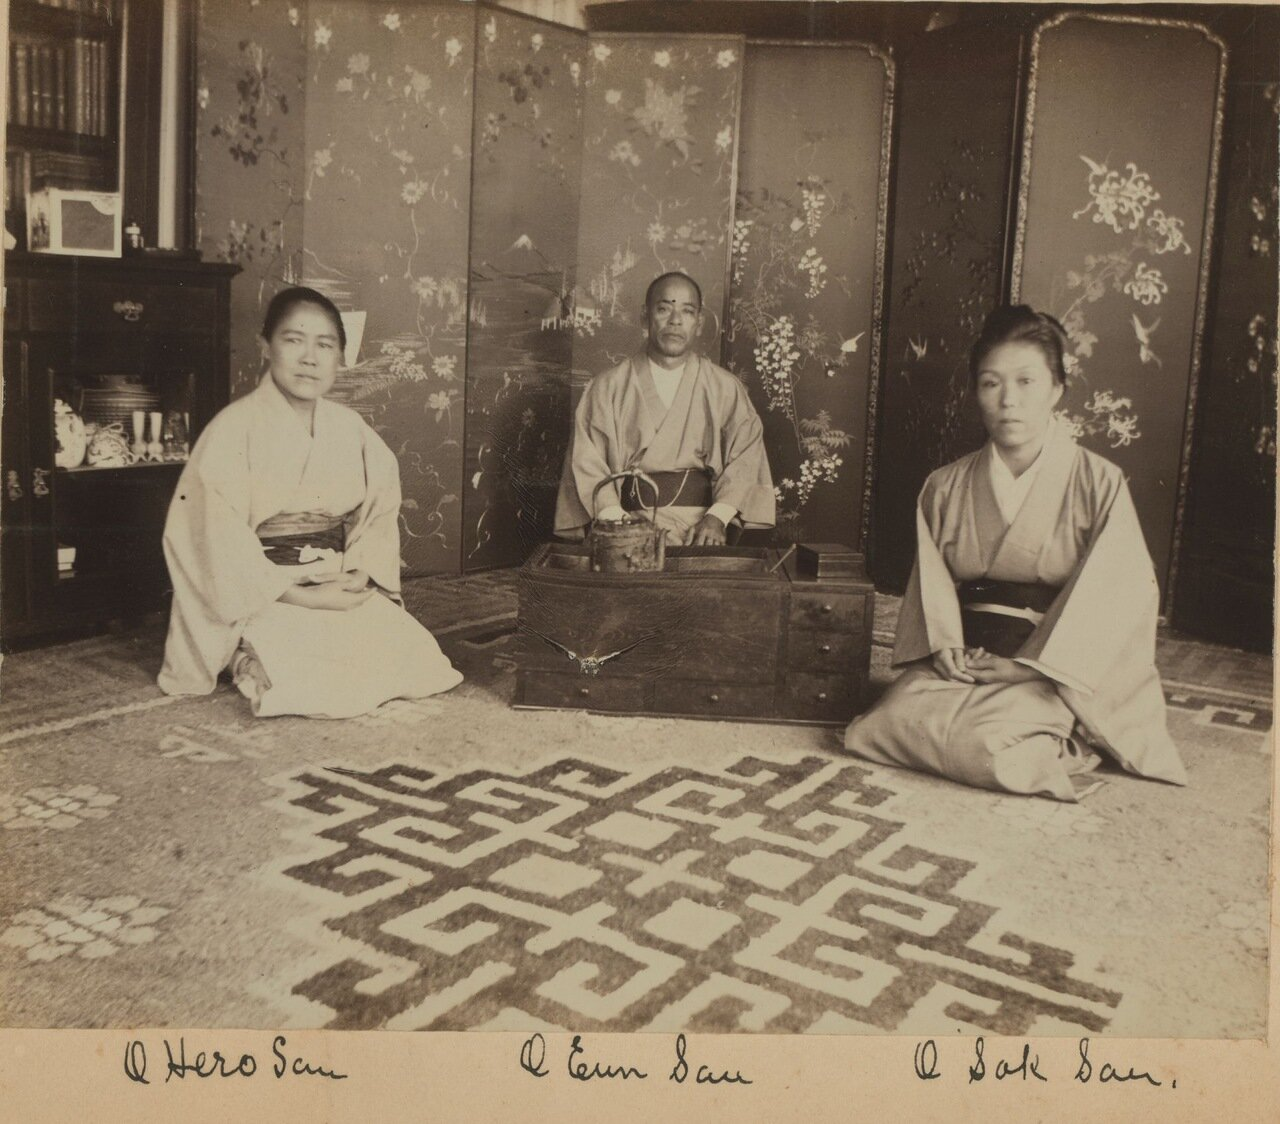 Японская прислуга. Охиро-сан, Оюн-Сан и Осок-сан на террасе